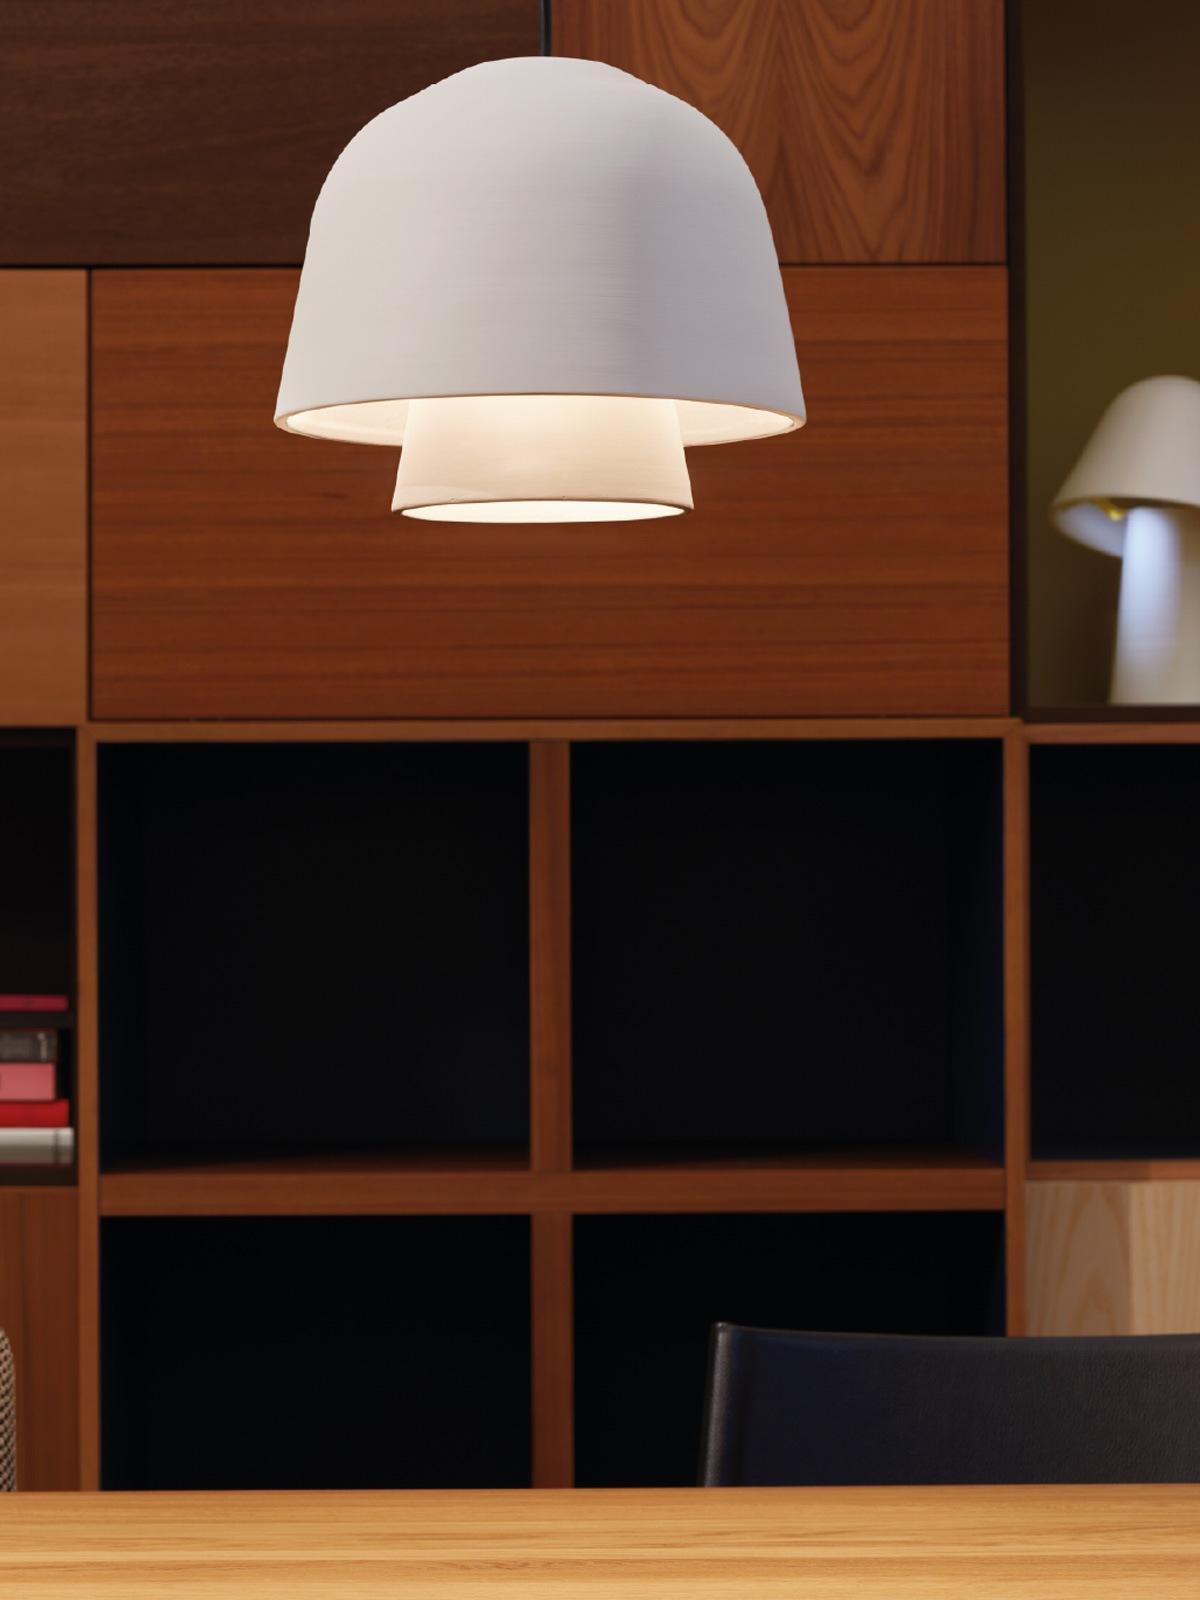 DesignOrt Blog: Leuchten wie Pilze Okina 30 Pott Keramikleuchte Designort Lampen Berlin Onlineshop